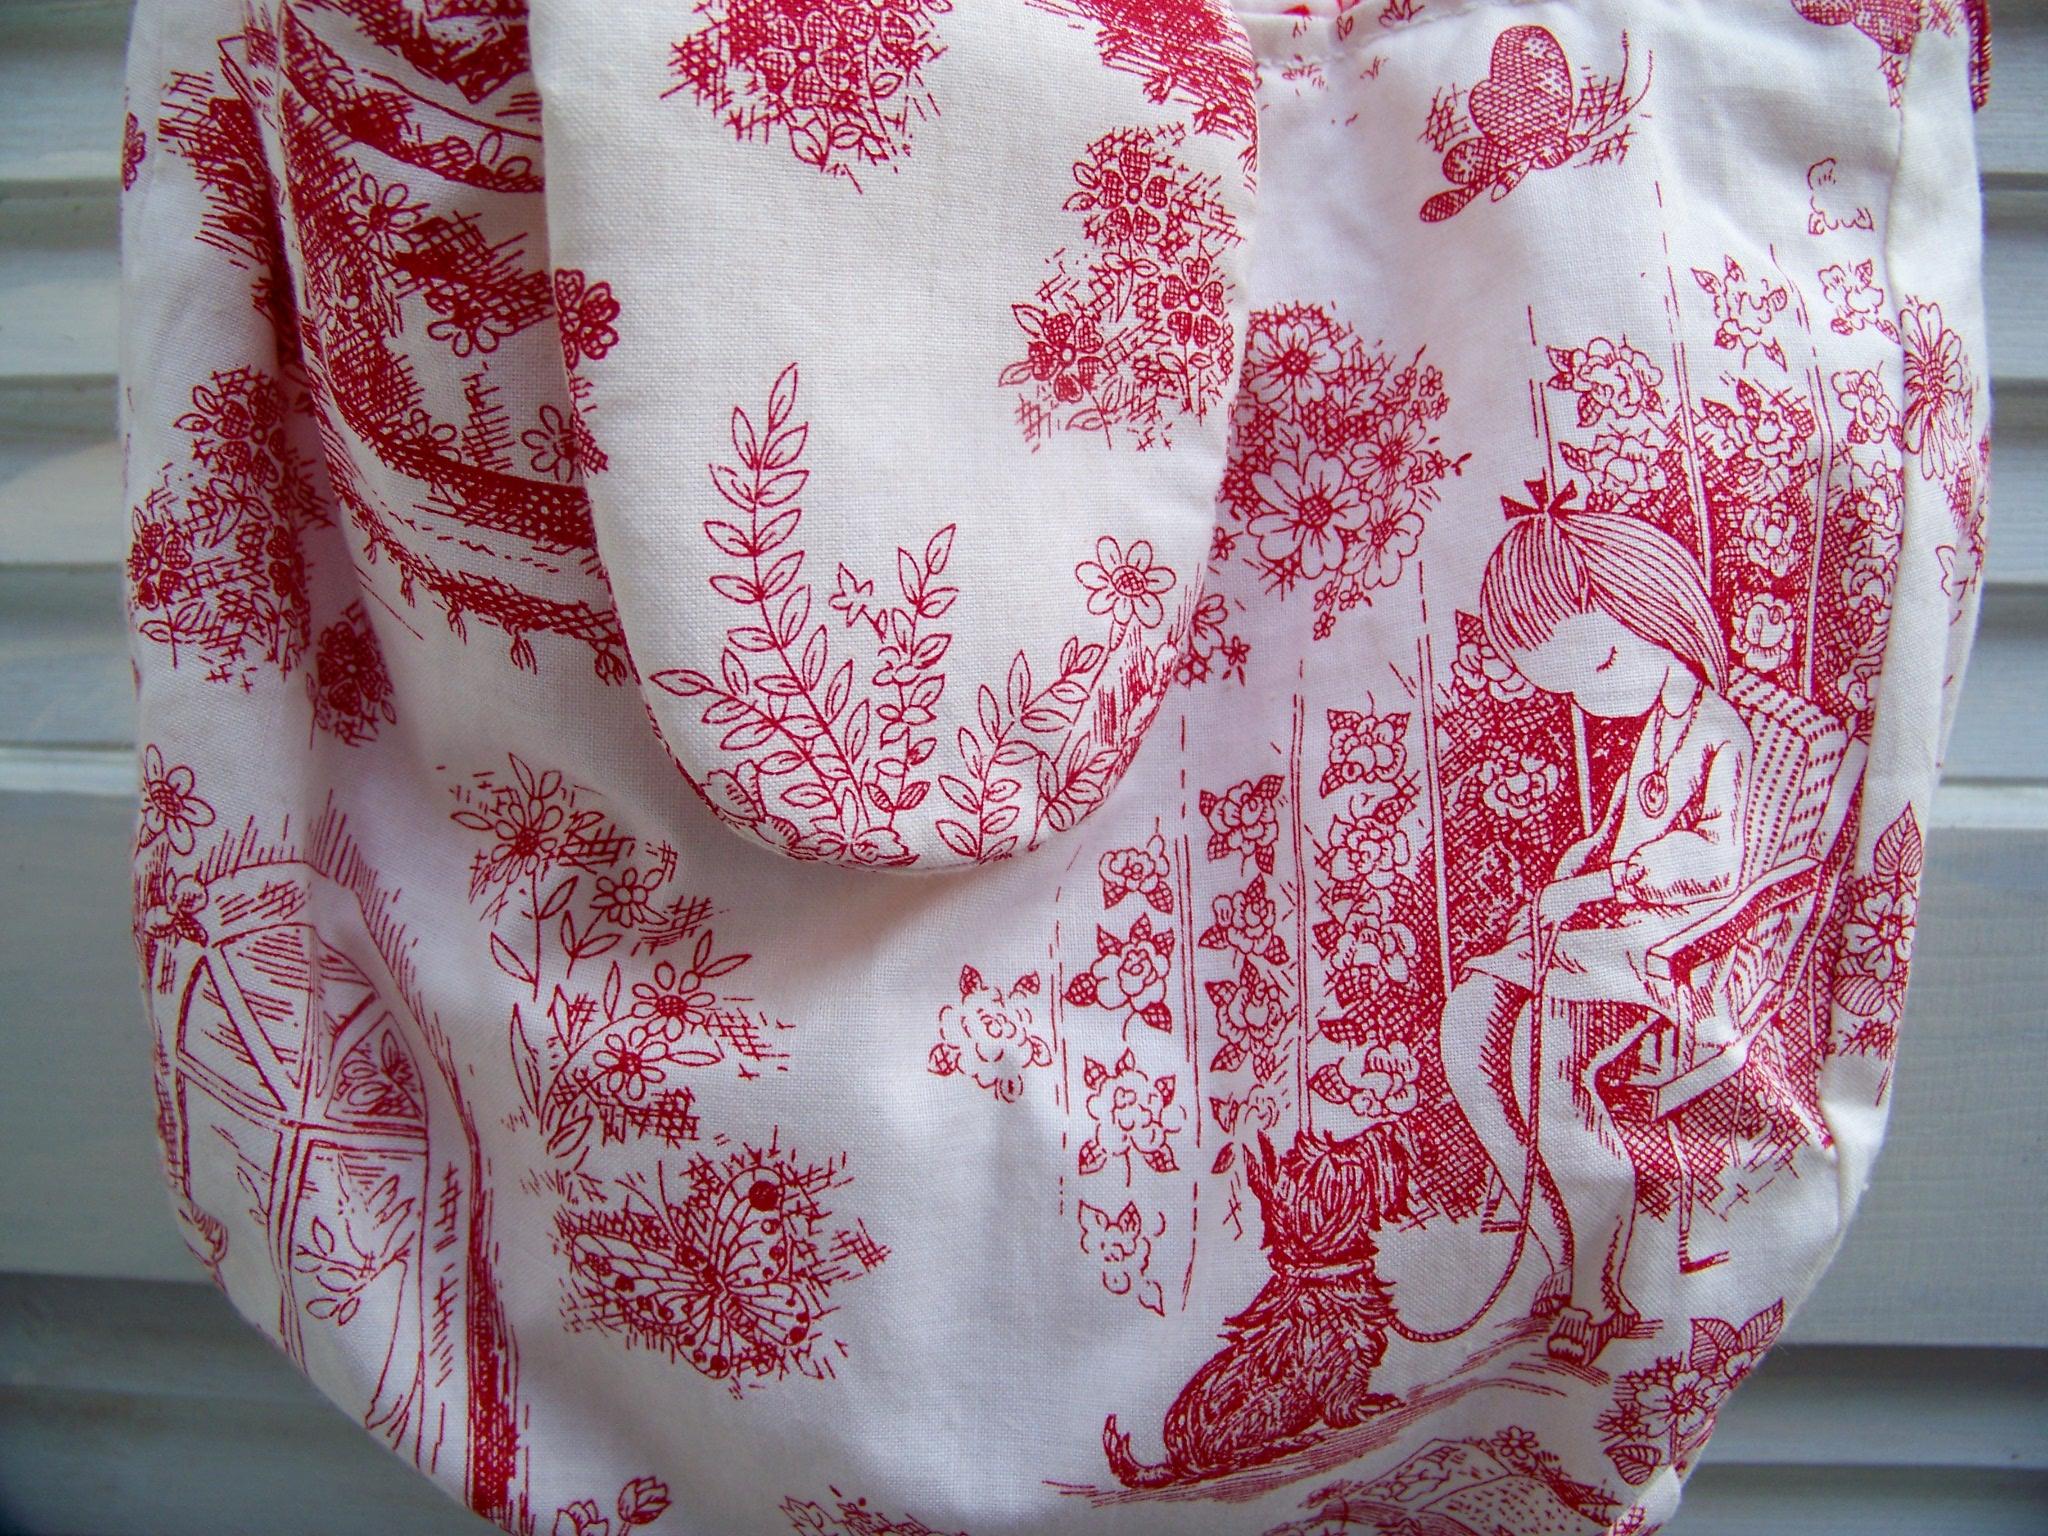 Rosemary's Handbags Handmade